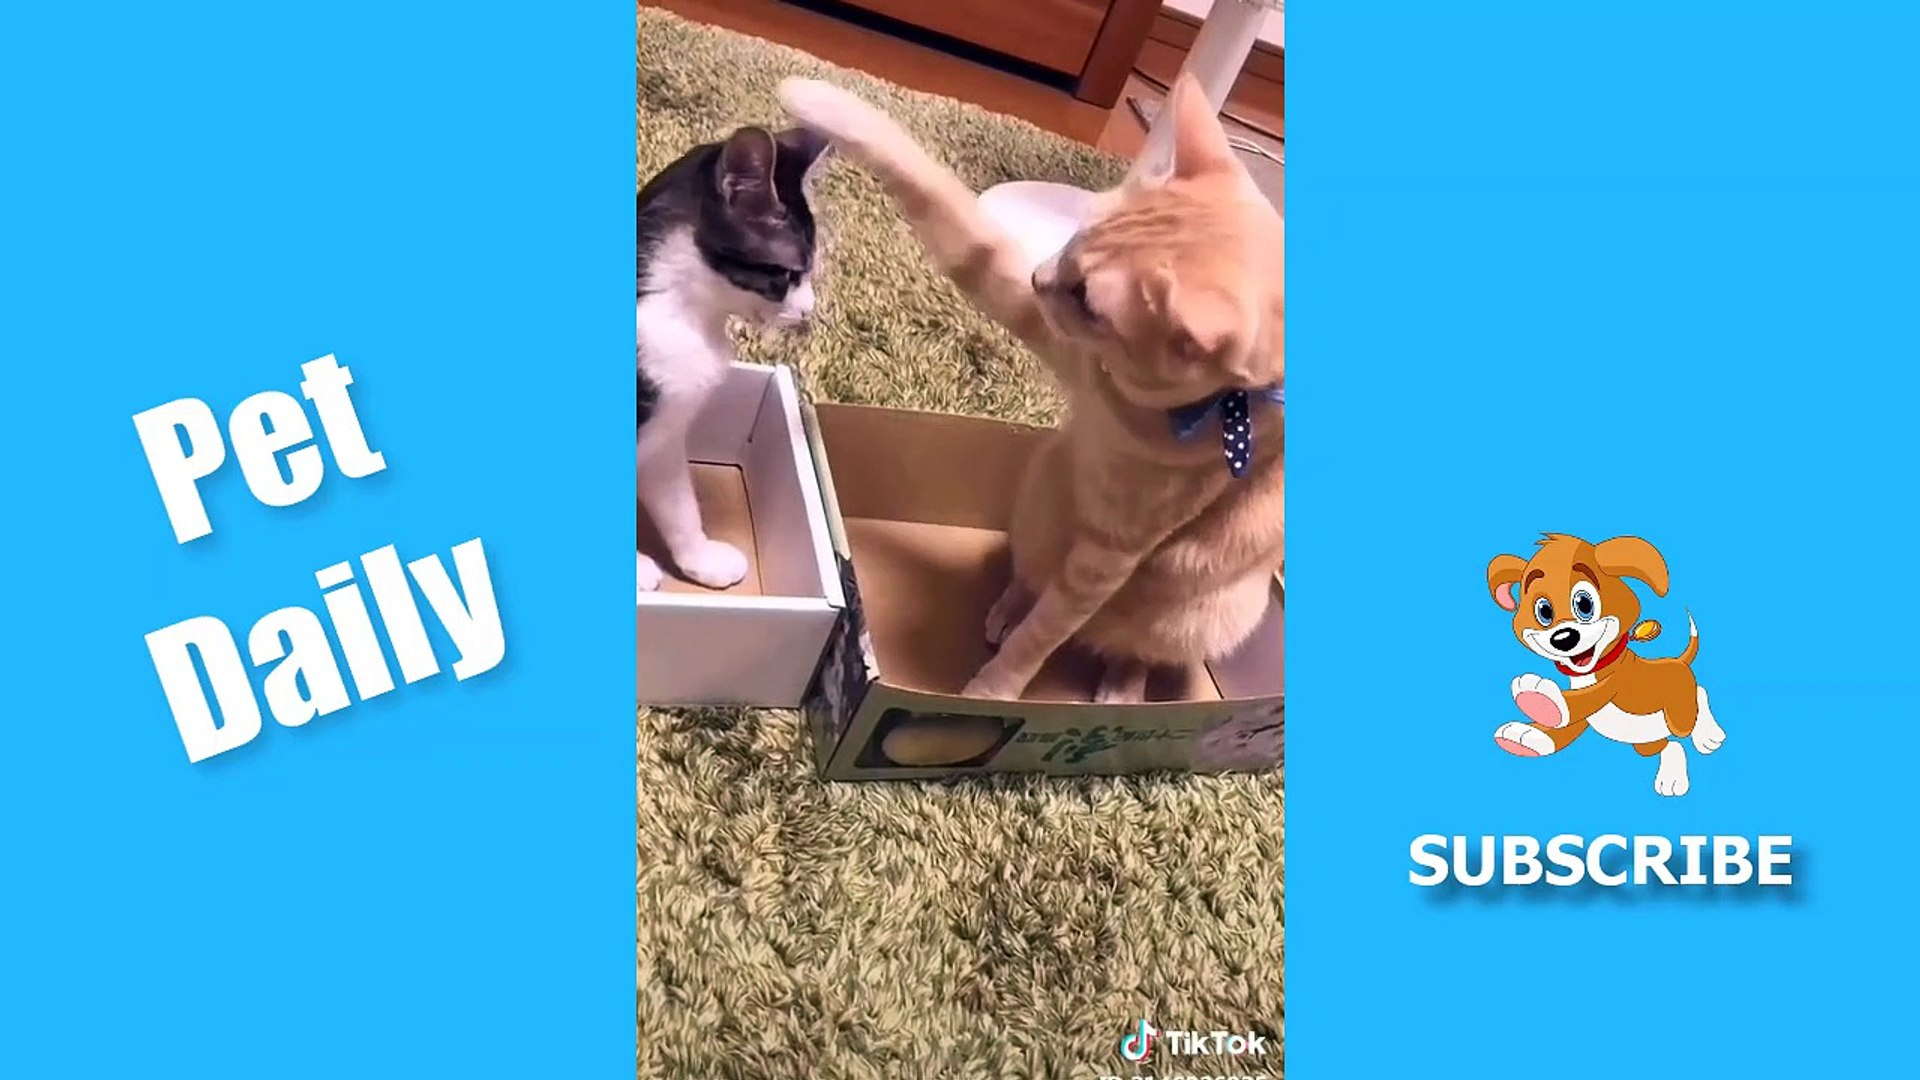 Pet Daily Funny Animals TikTok Pets Compilation #1